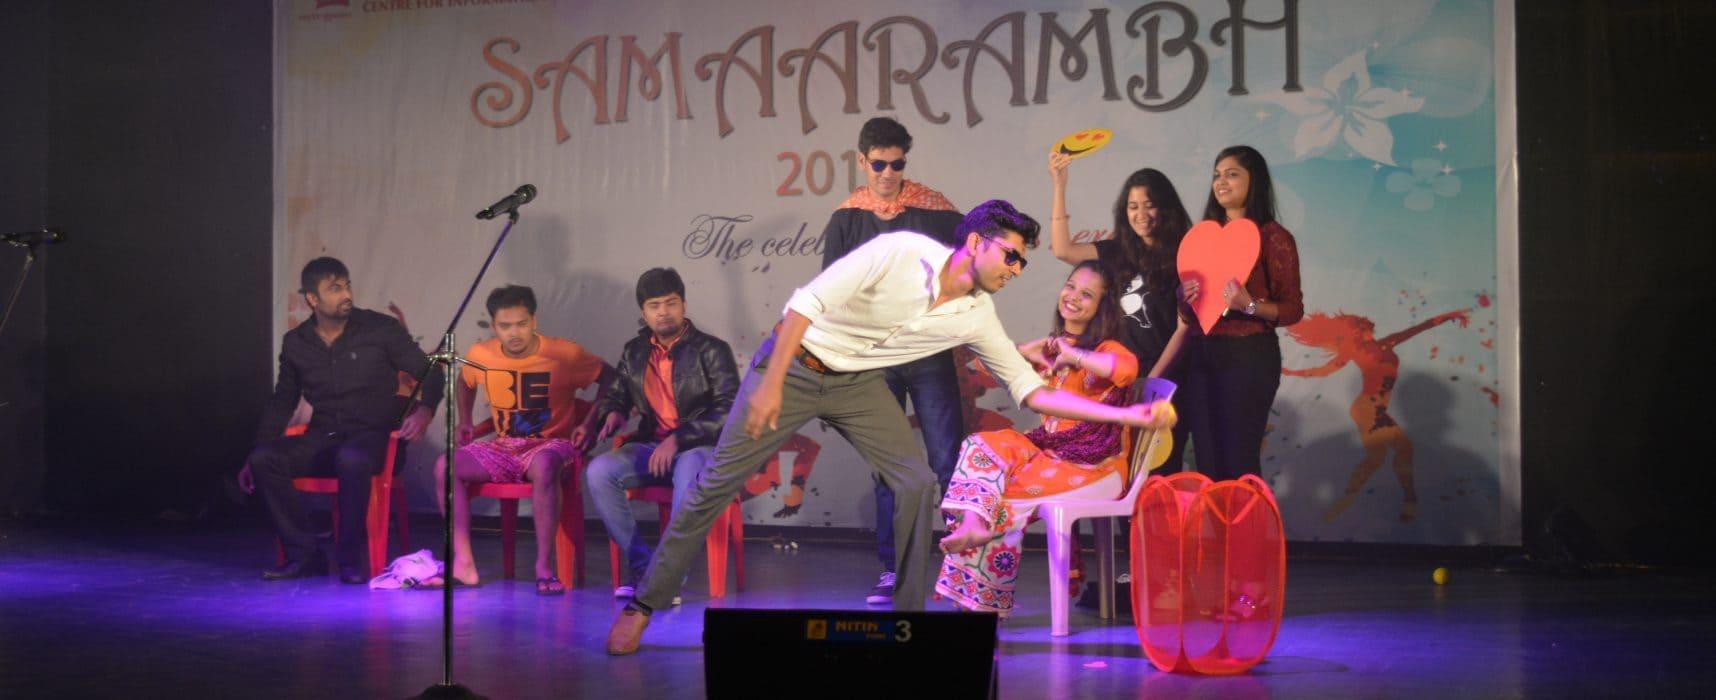 Samaarambh 2018